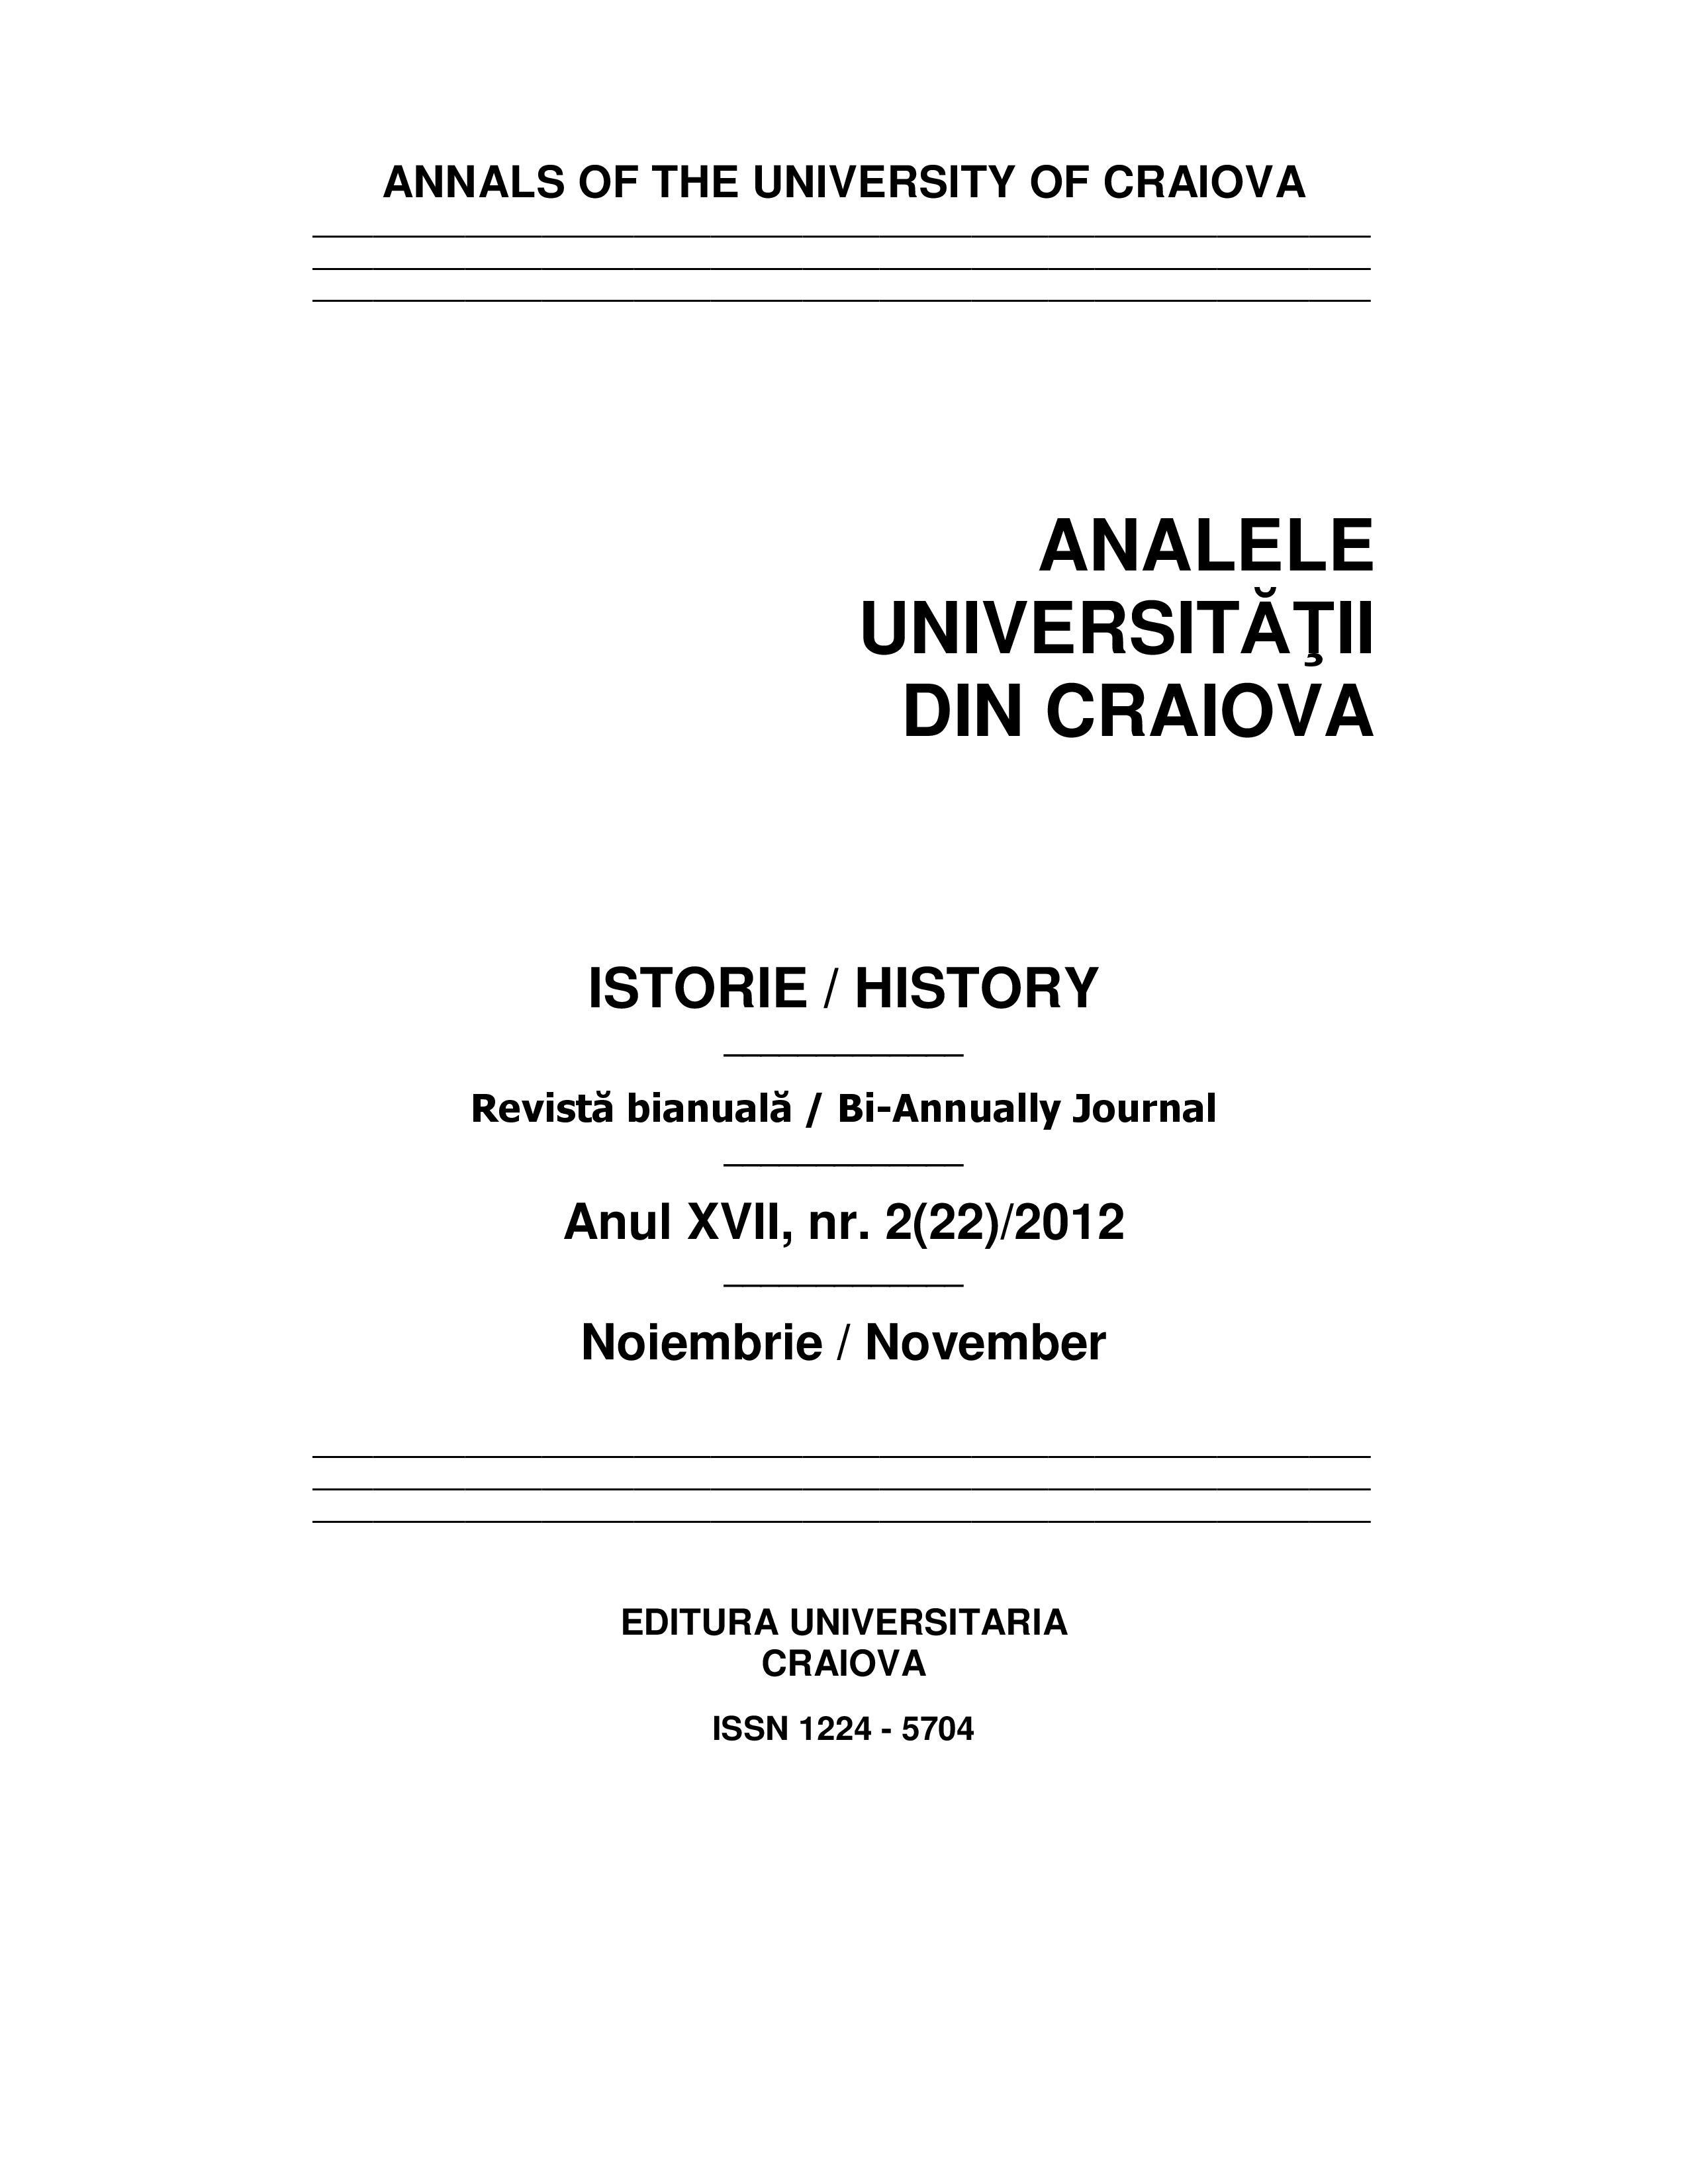 Coperta_Anale_2012_2_ISTORIE PDF-page-001